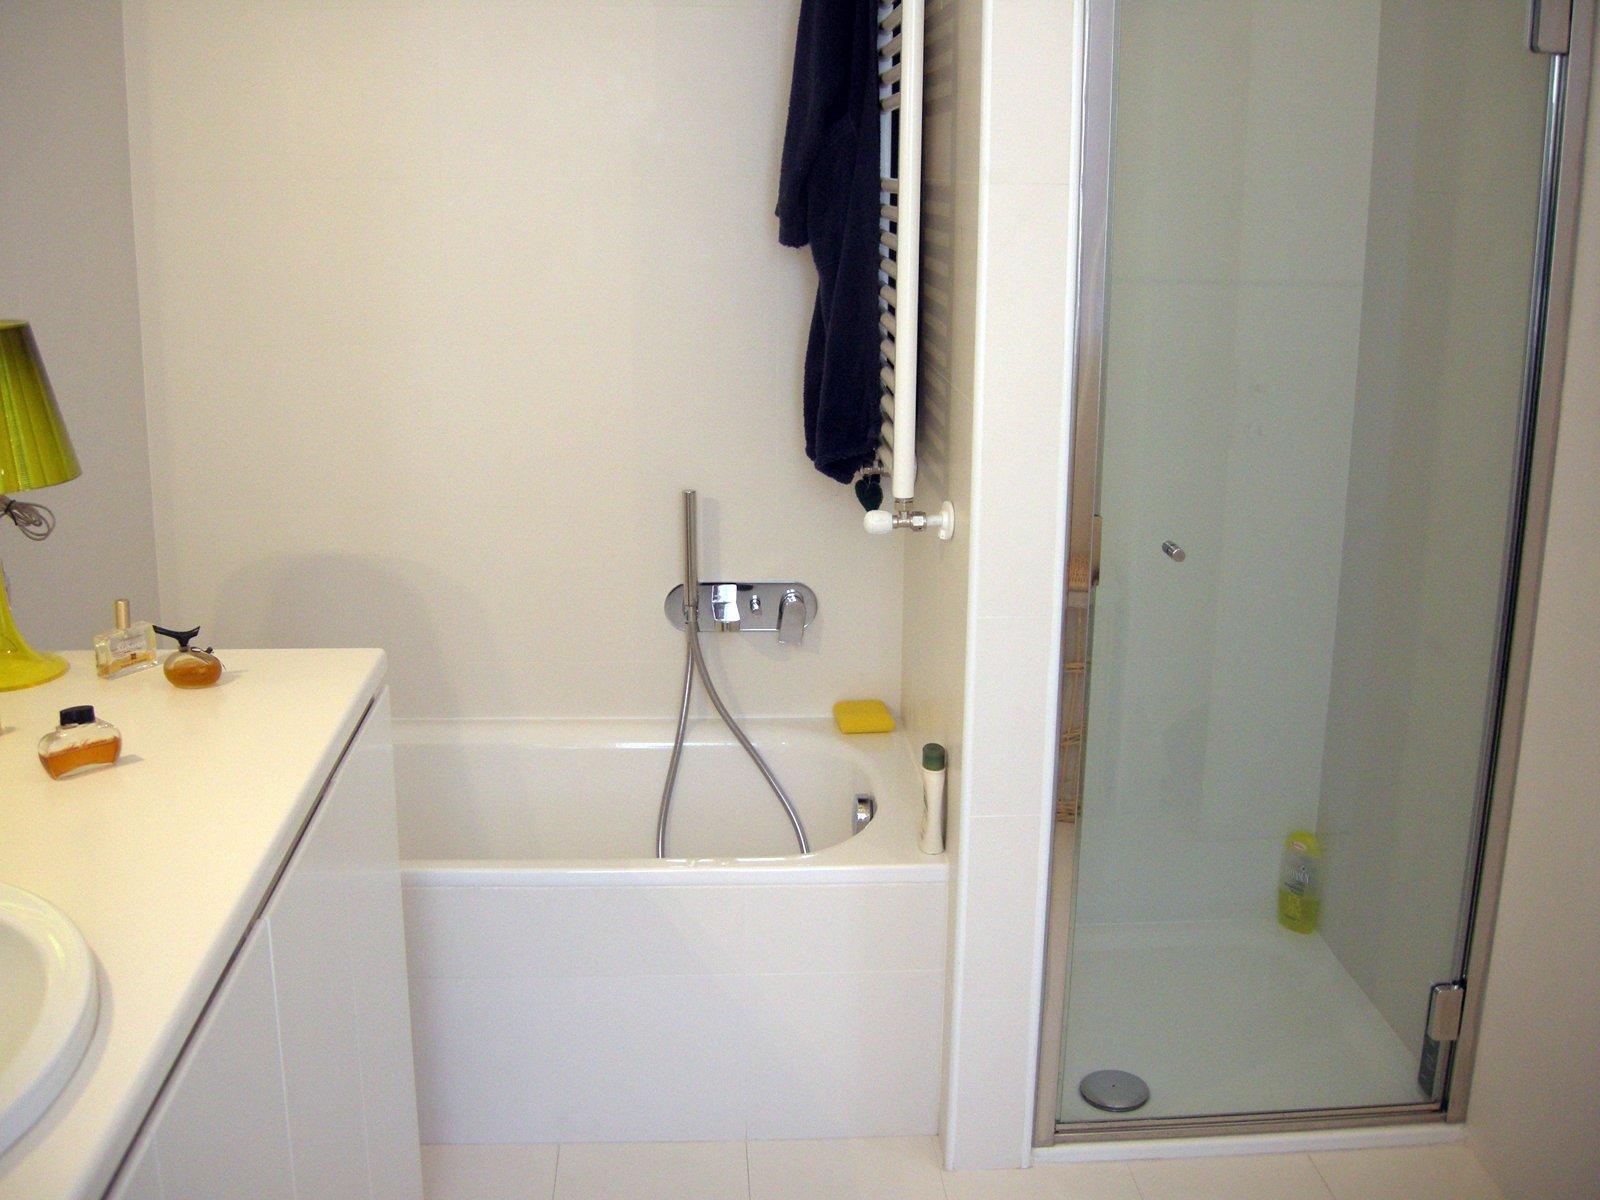 Bagno cieco umidita la scelta giusta variata sul - Aspiratore bagno umidita ...